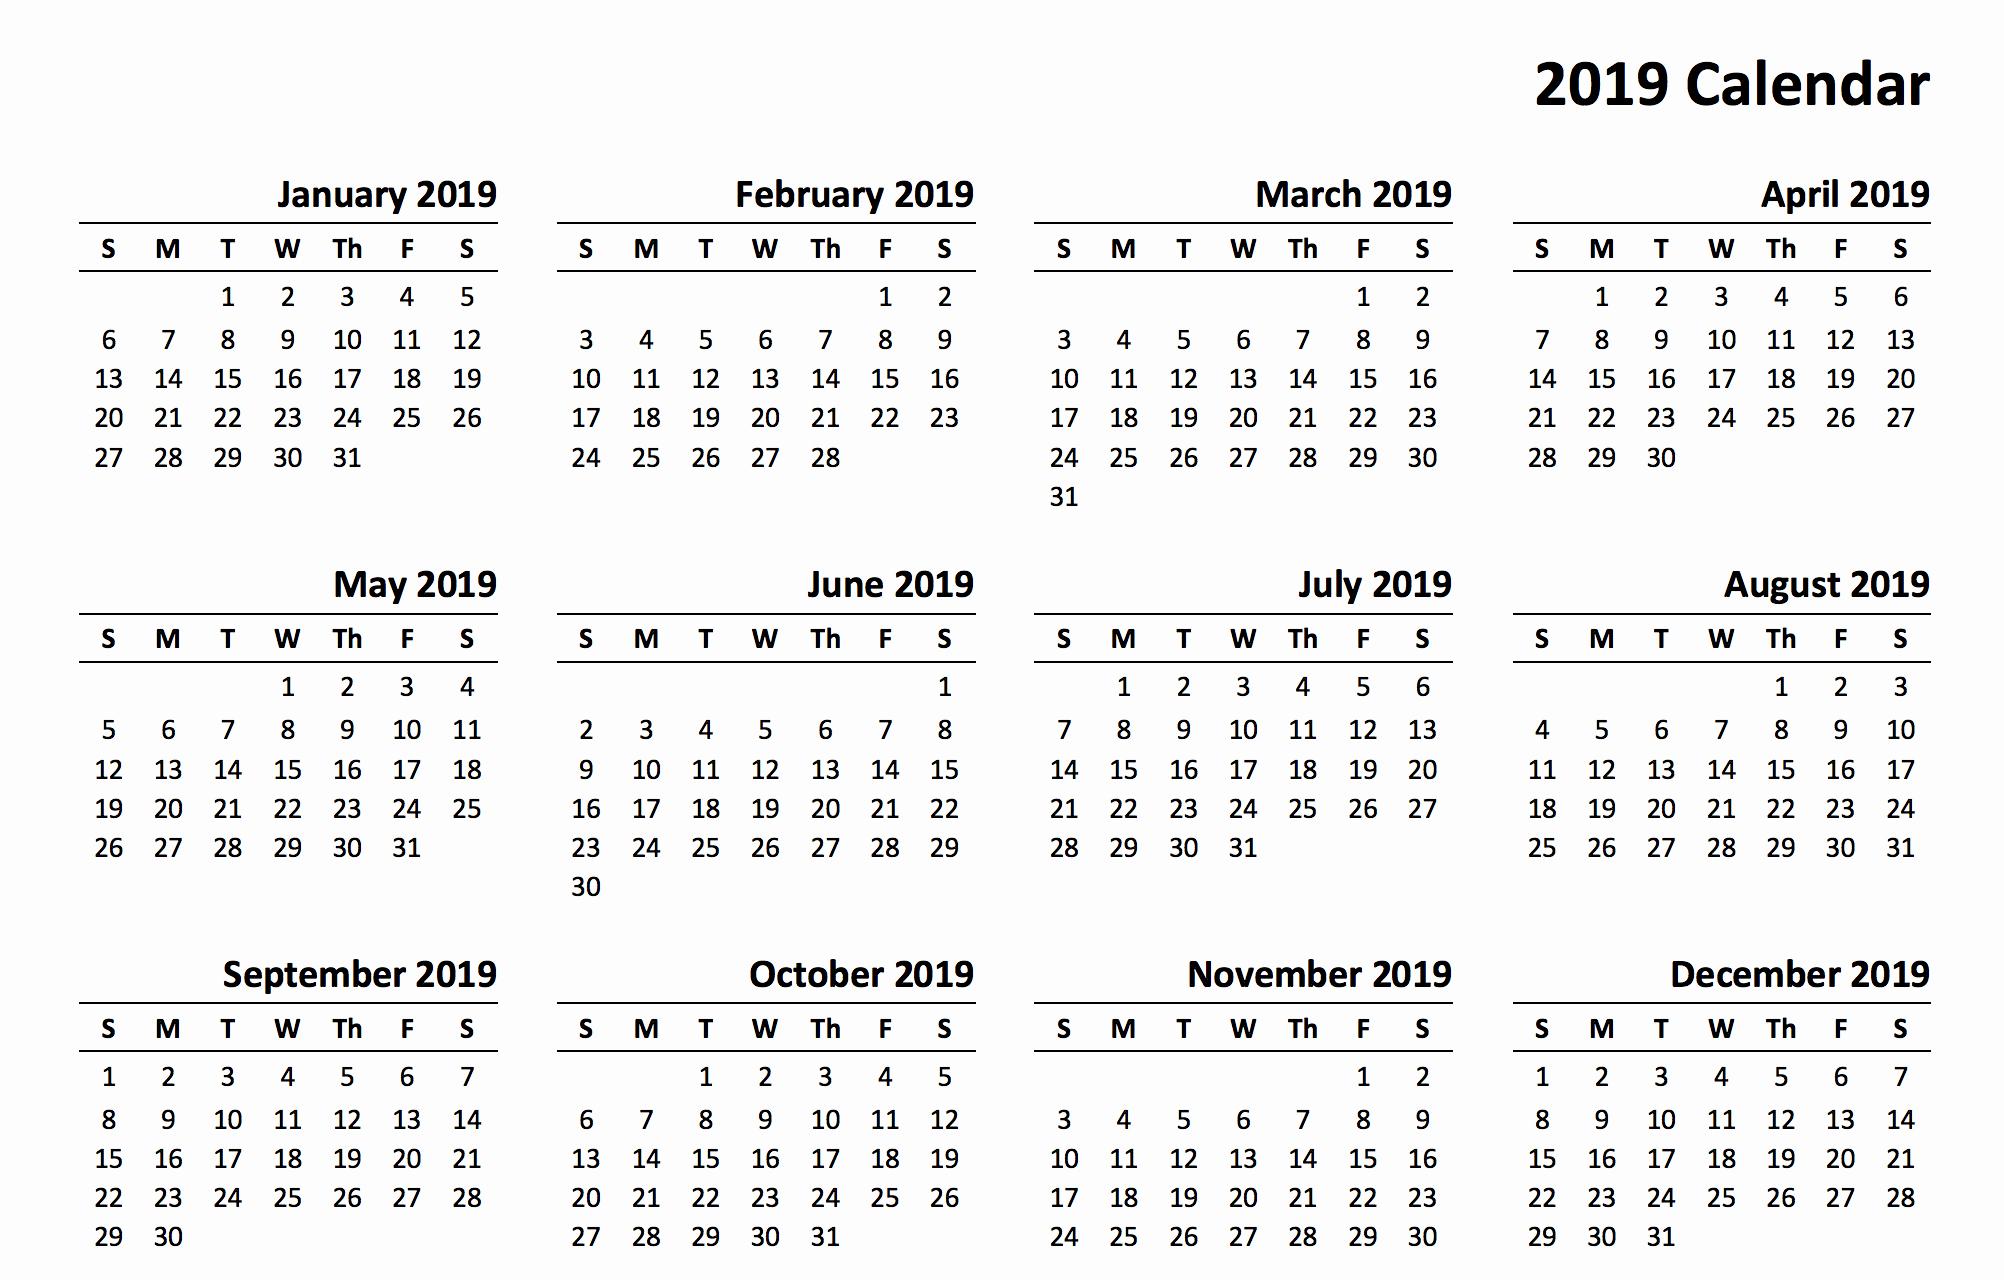 Blank Calendar Template 2019 New 2019 Printable Calendar Templates Pdf Excel Word Free